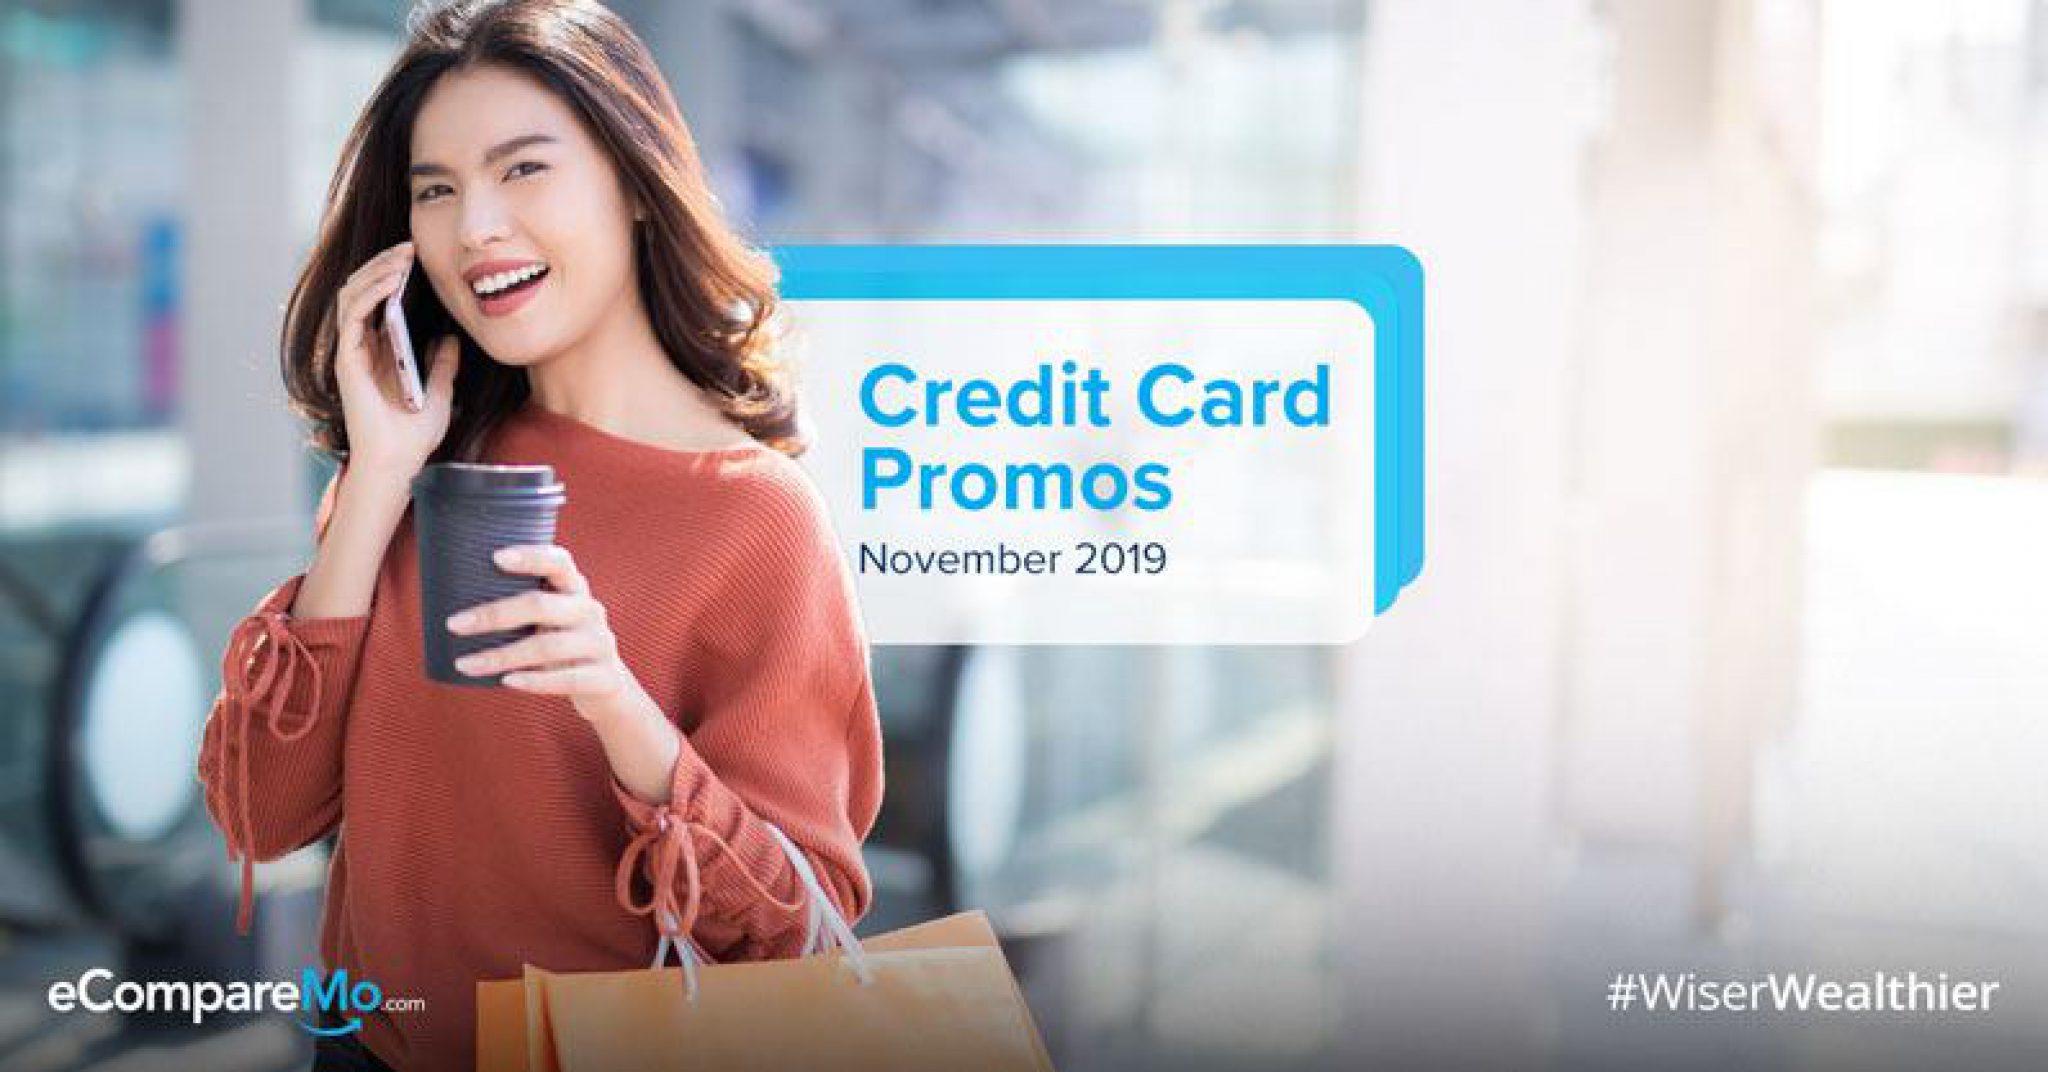 Credit Card Promo November 2019